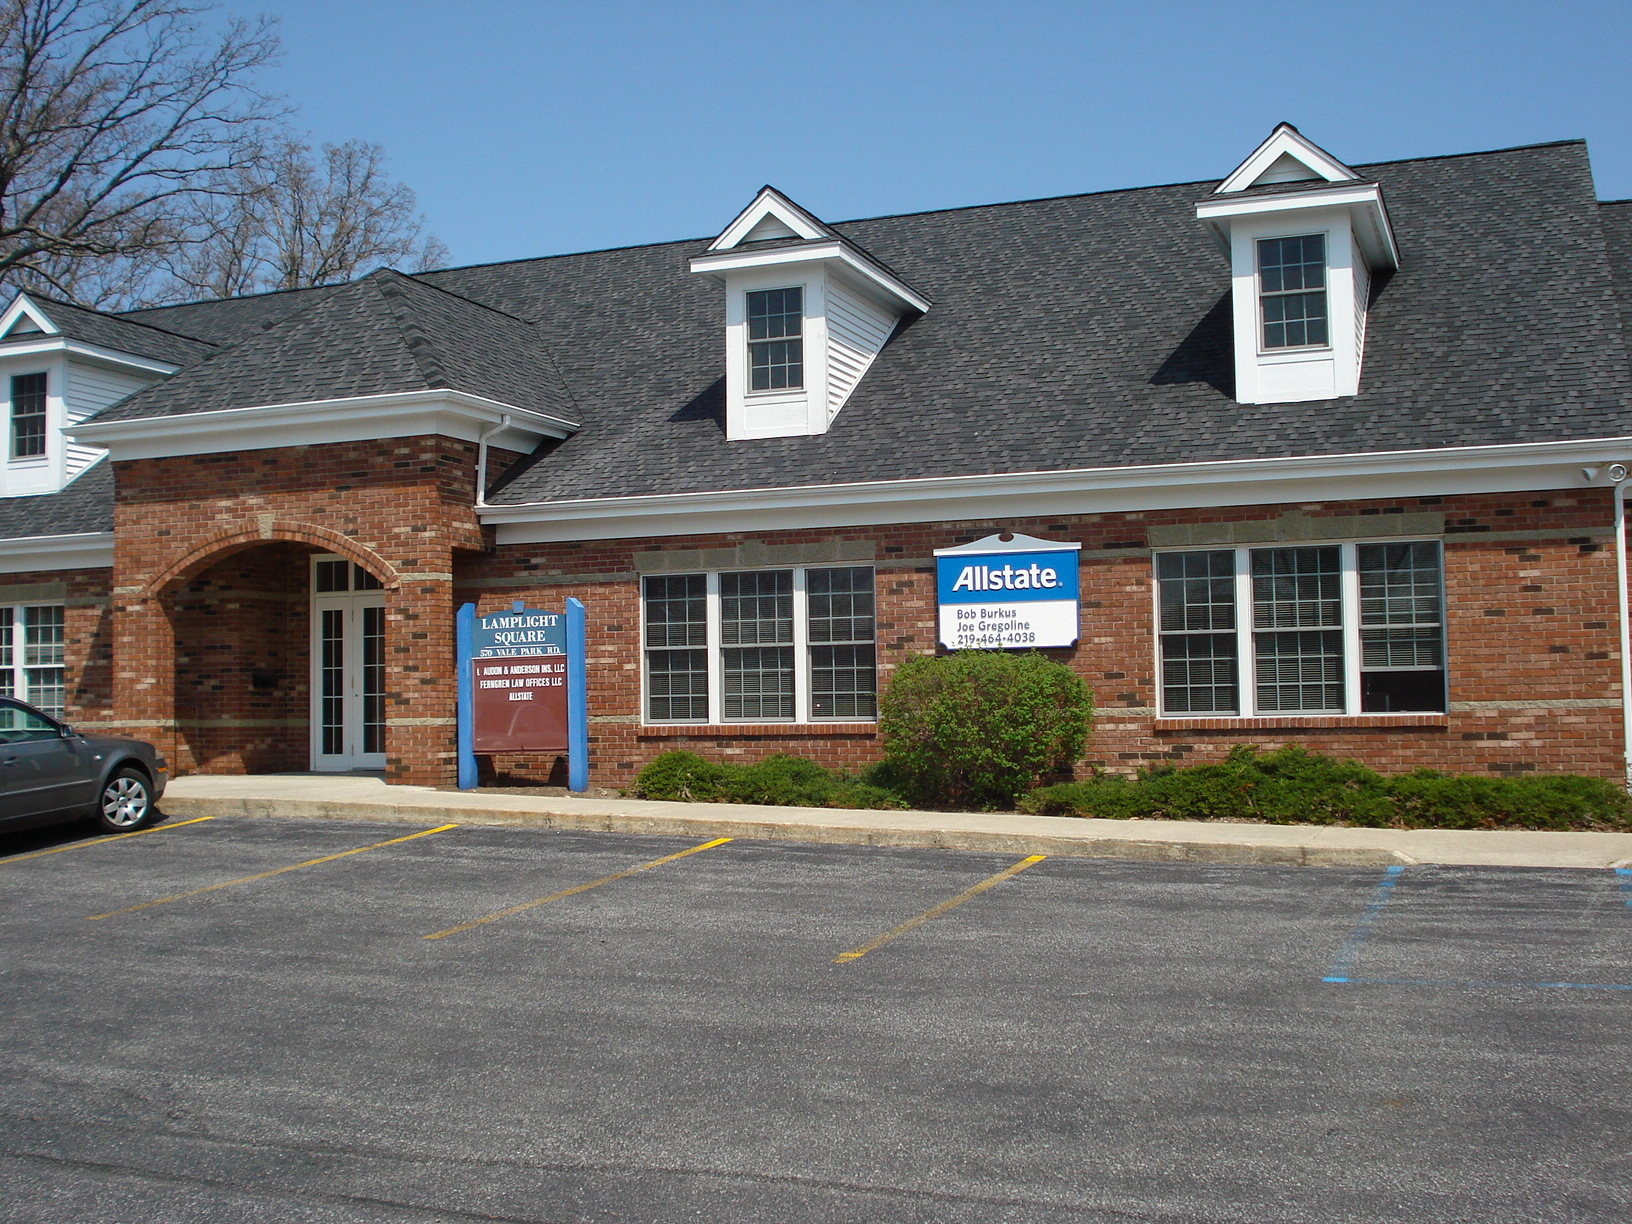 Allstate Insurance Agent: Joe Gregoline image 1